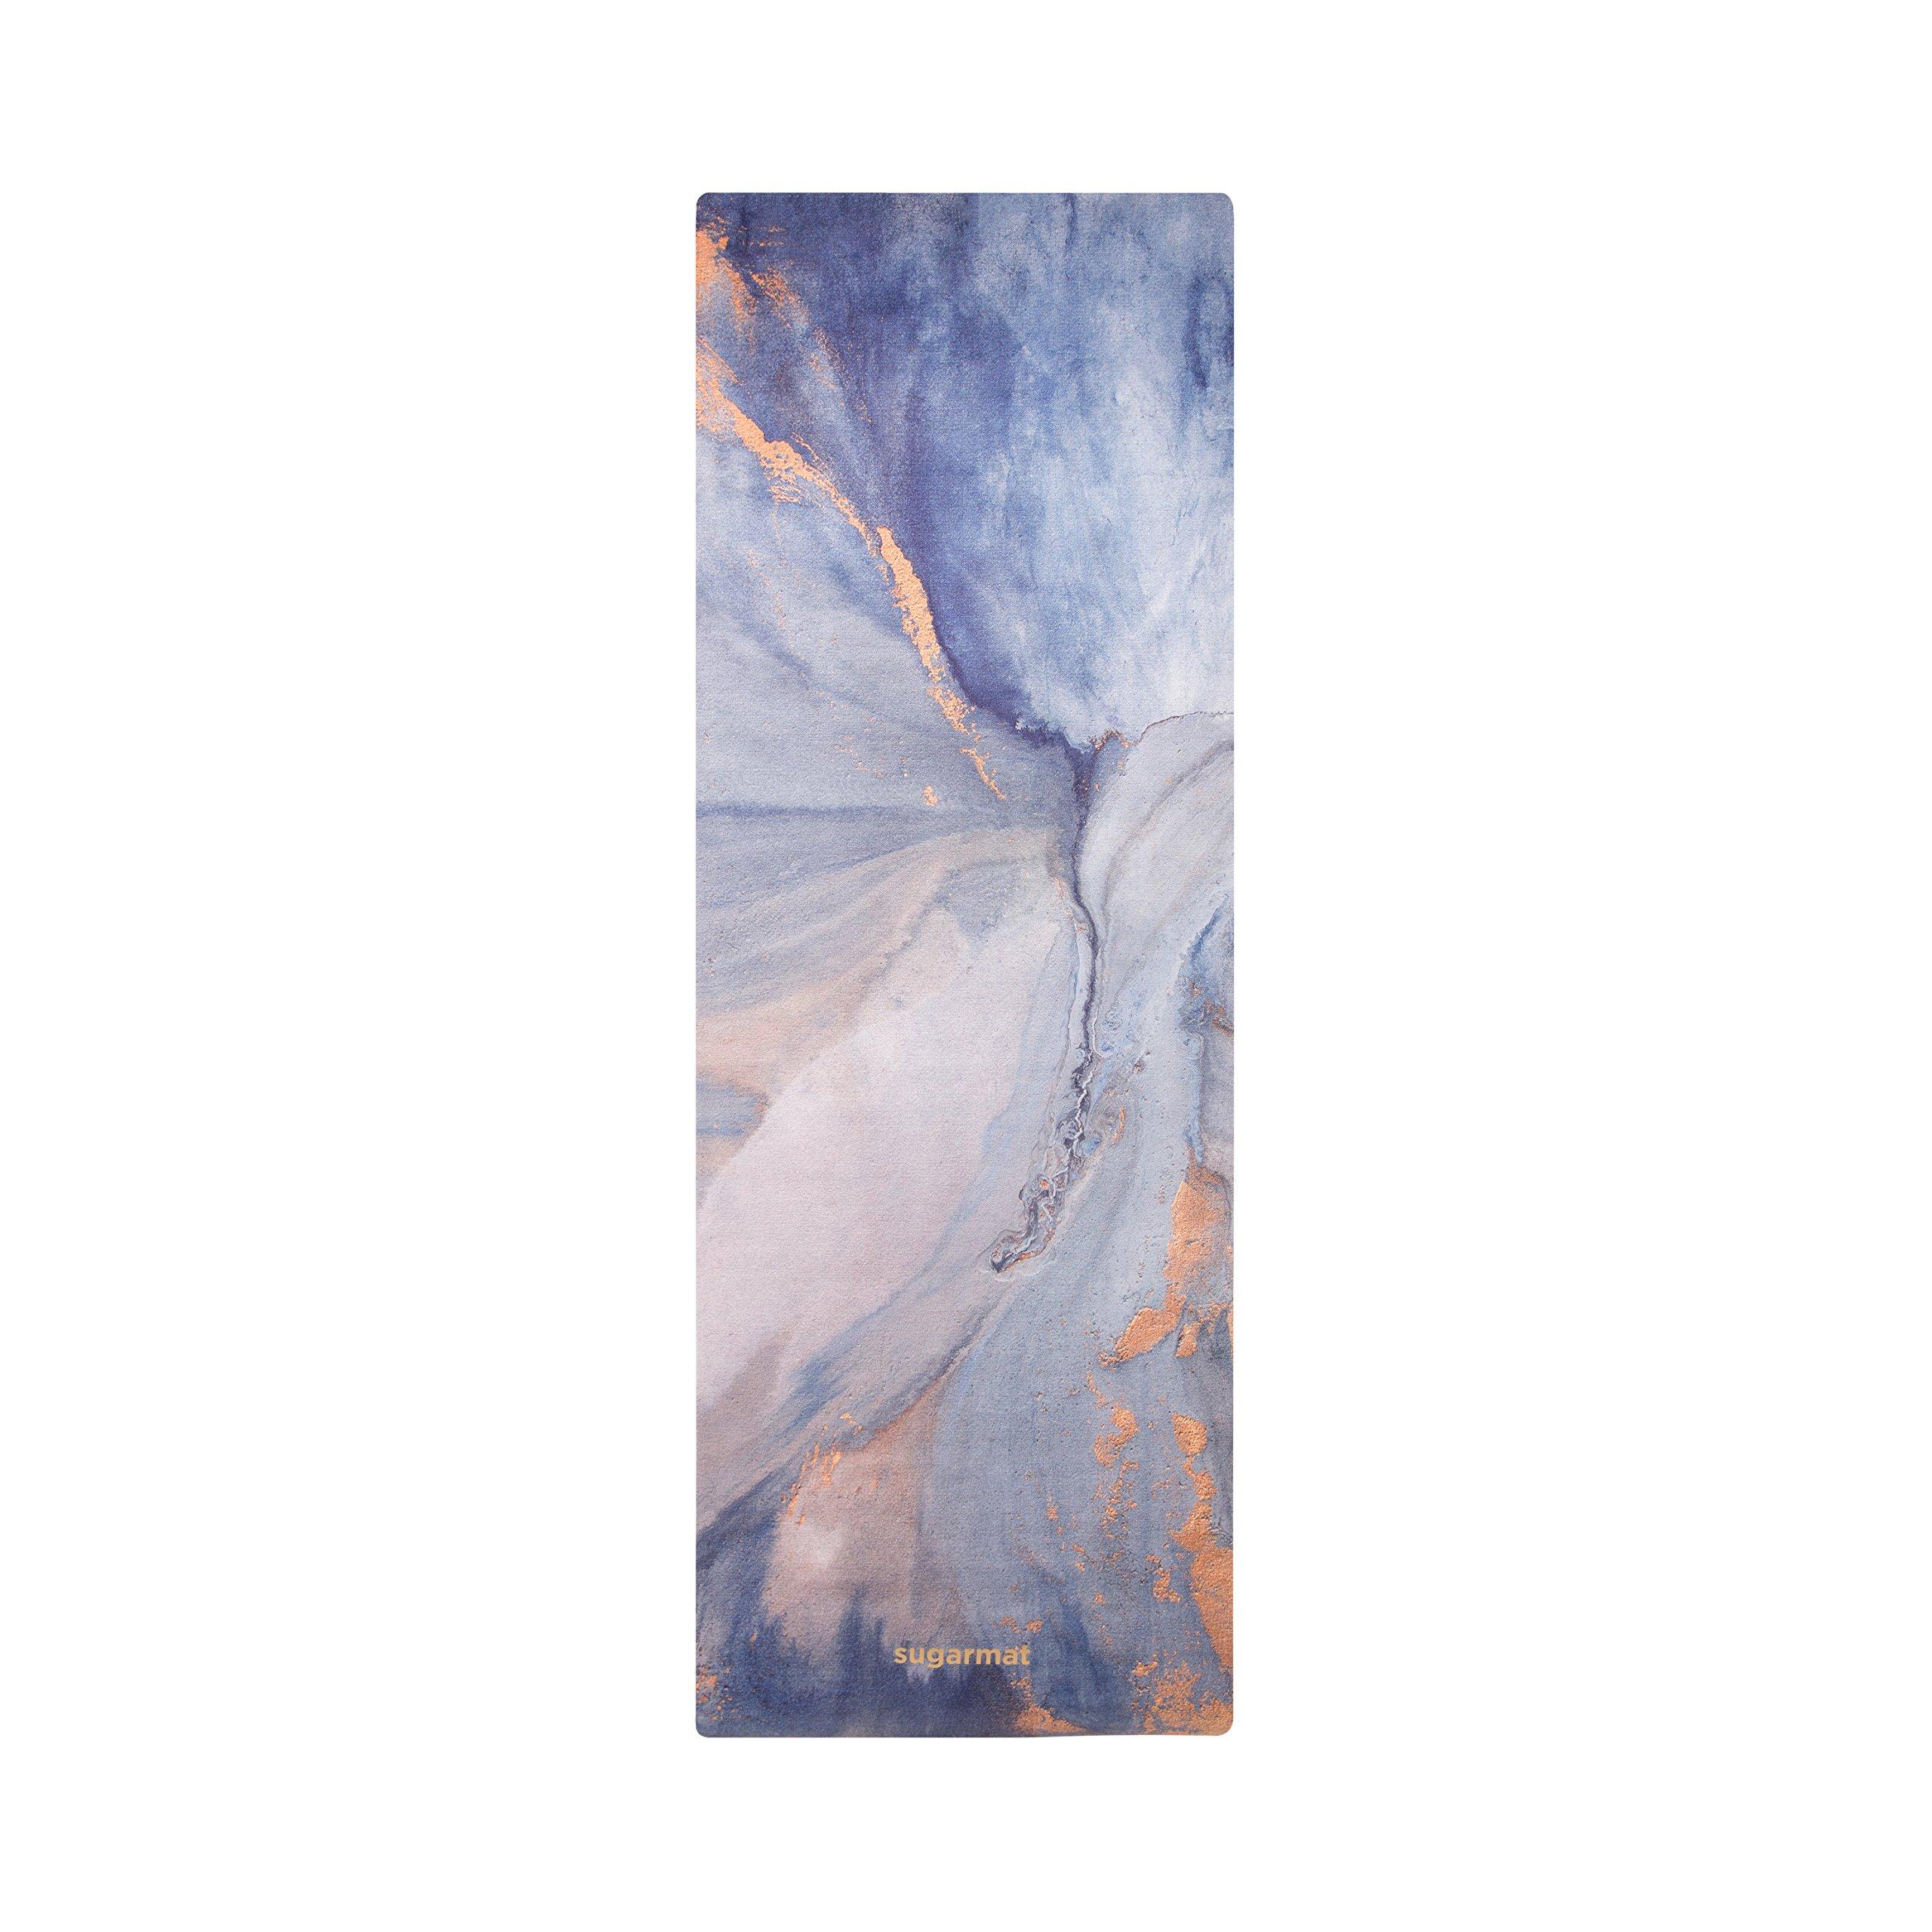 ''Soft Awakening'' Designer Yoga Mat by Sugarmat I Eco Luxury and Non-slip I Designed in Montreal I Ideal for Yoga, hot yoga, Pilates I Machine washable I Non-faded color I Include yoga strap by Sugarmat